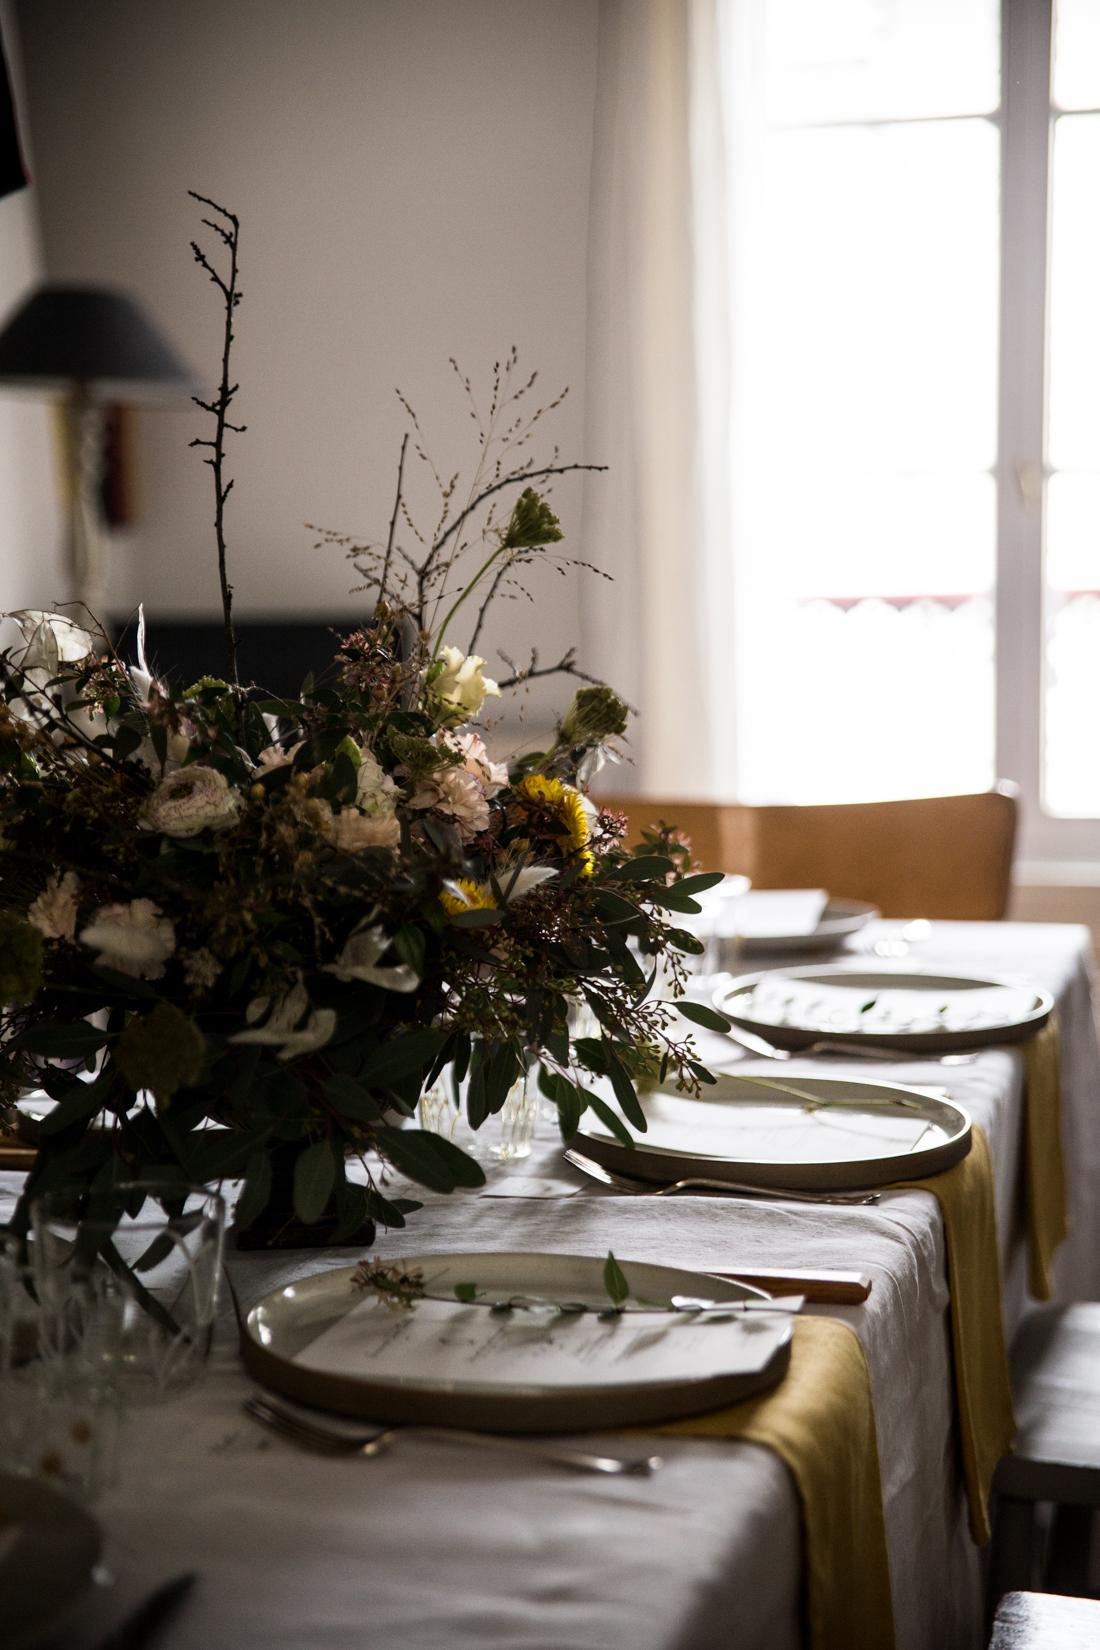 table-workshop-ophelies-kitchen-book-ophelie-lauret-5